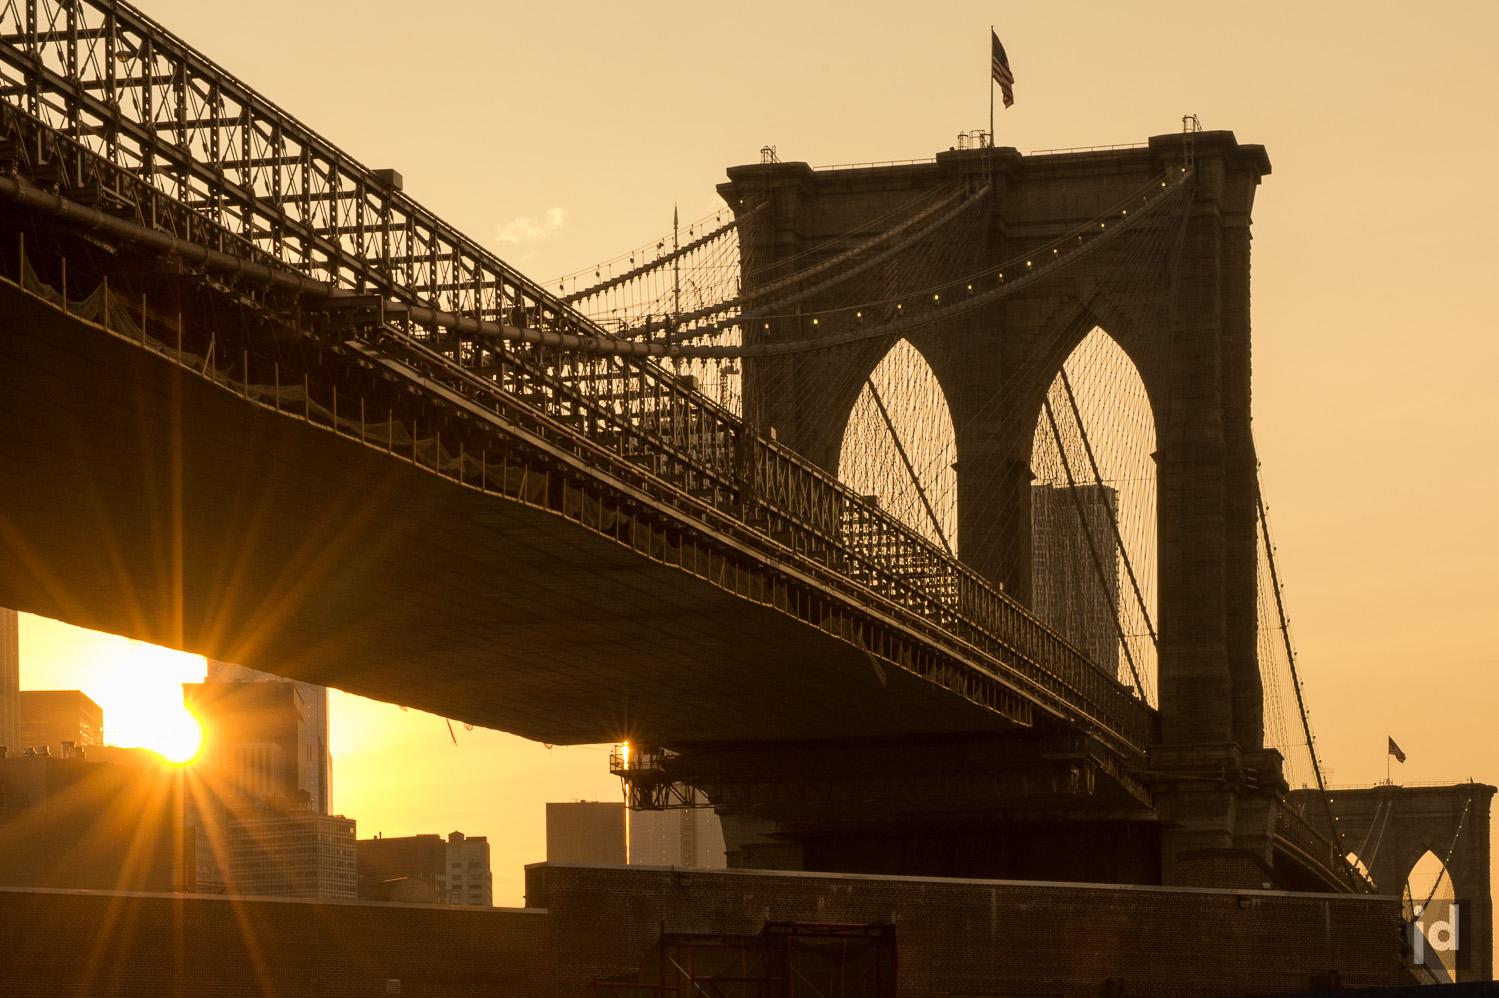 NewYork_USA_Photography_Jason_Davis_Images_030.jpg